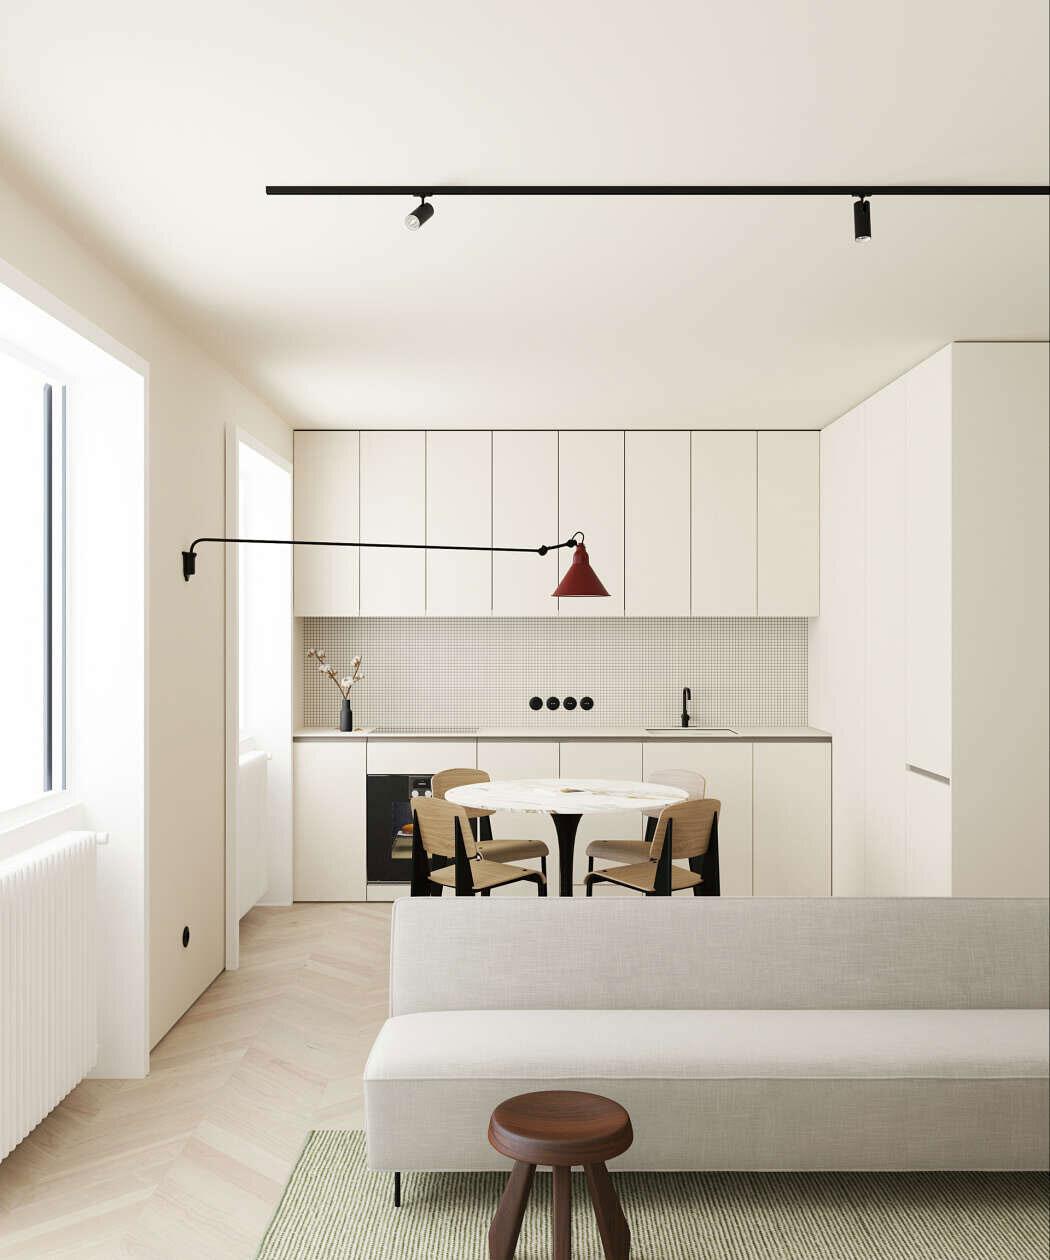 Lesson-in-warm-minimalism-Emil-Dervish-01.jpg